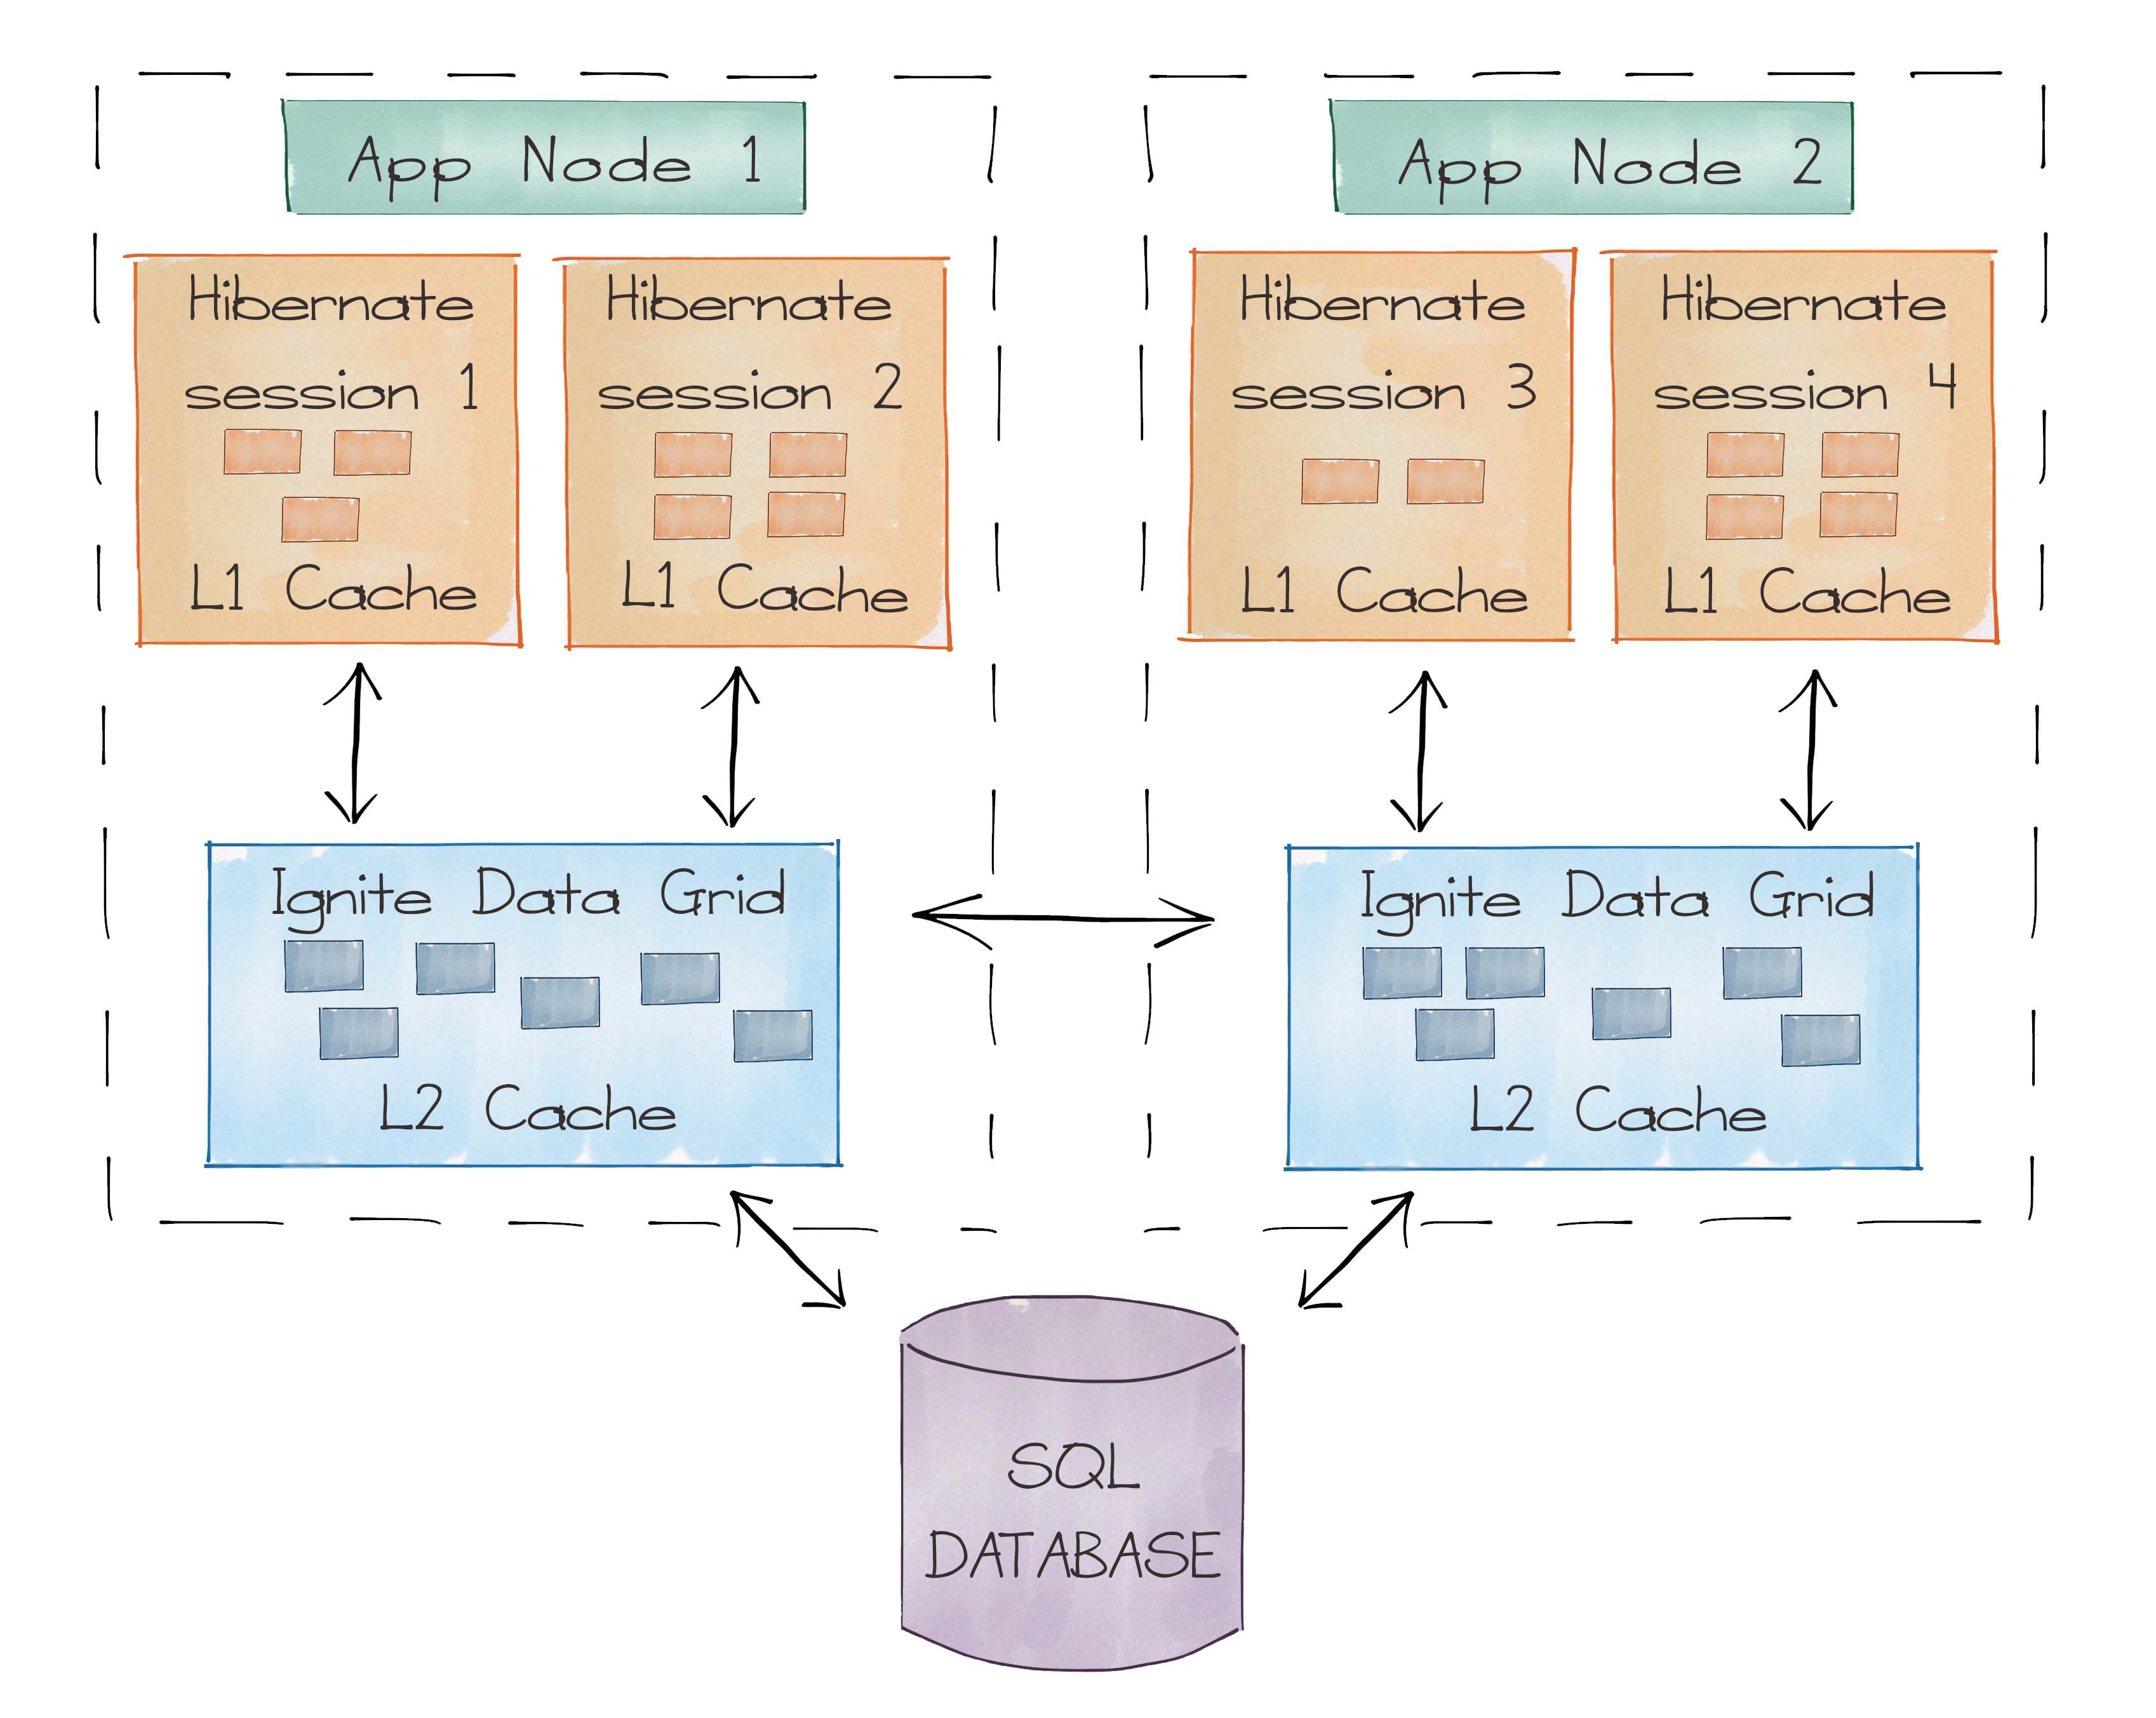 Hibernate cache configuration